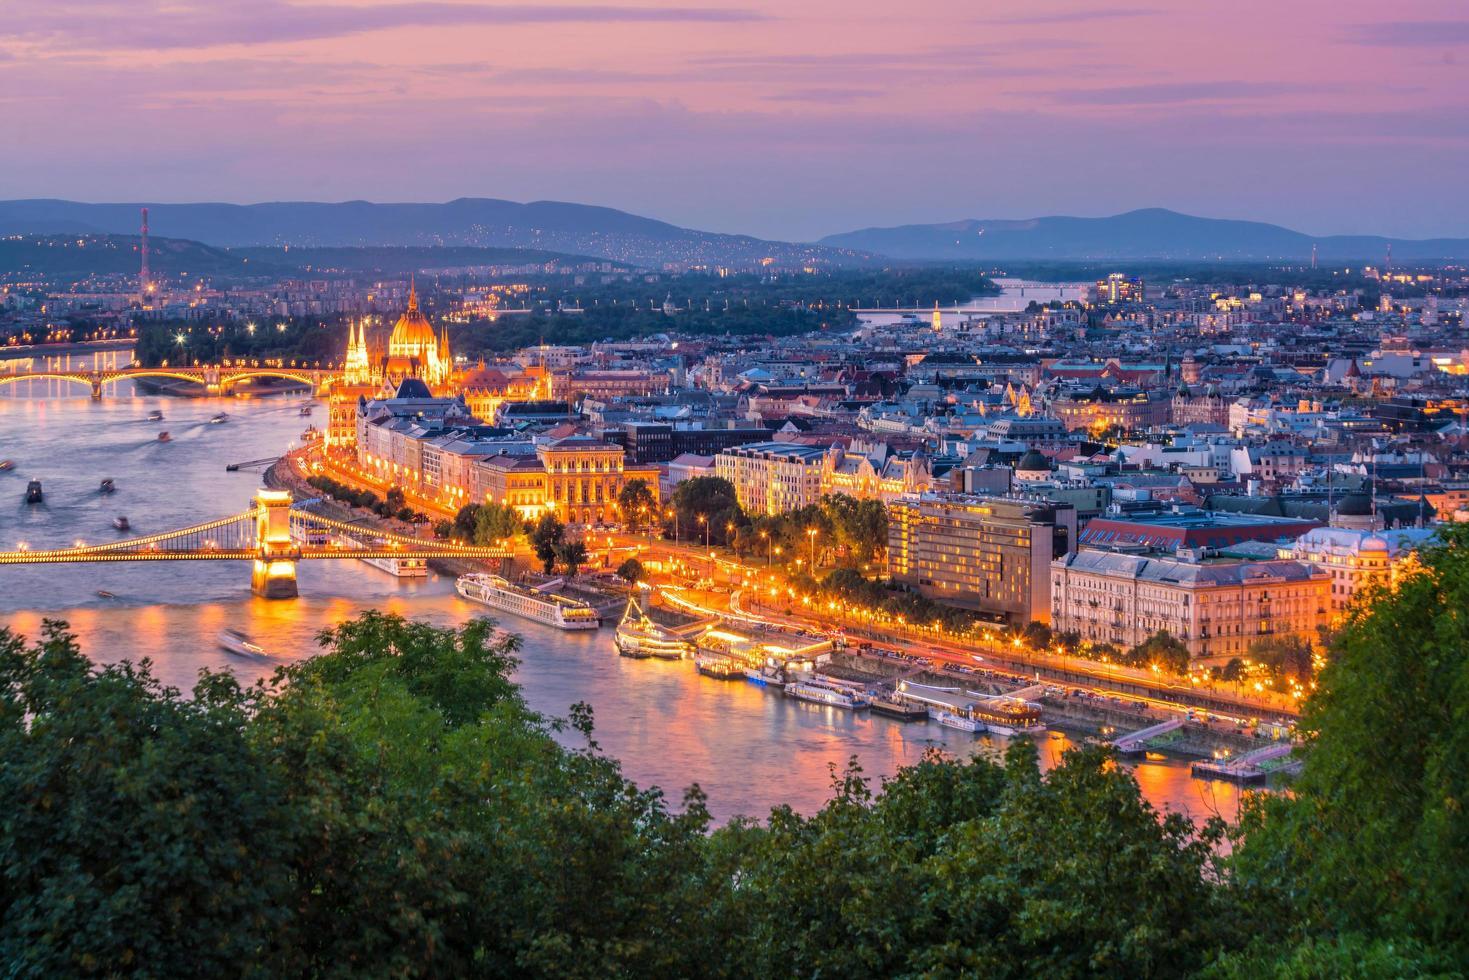 Budapest skyline at night photo